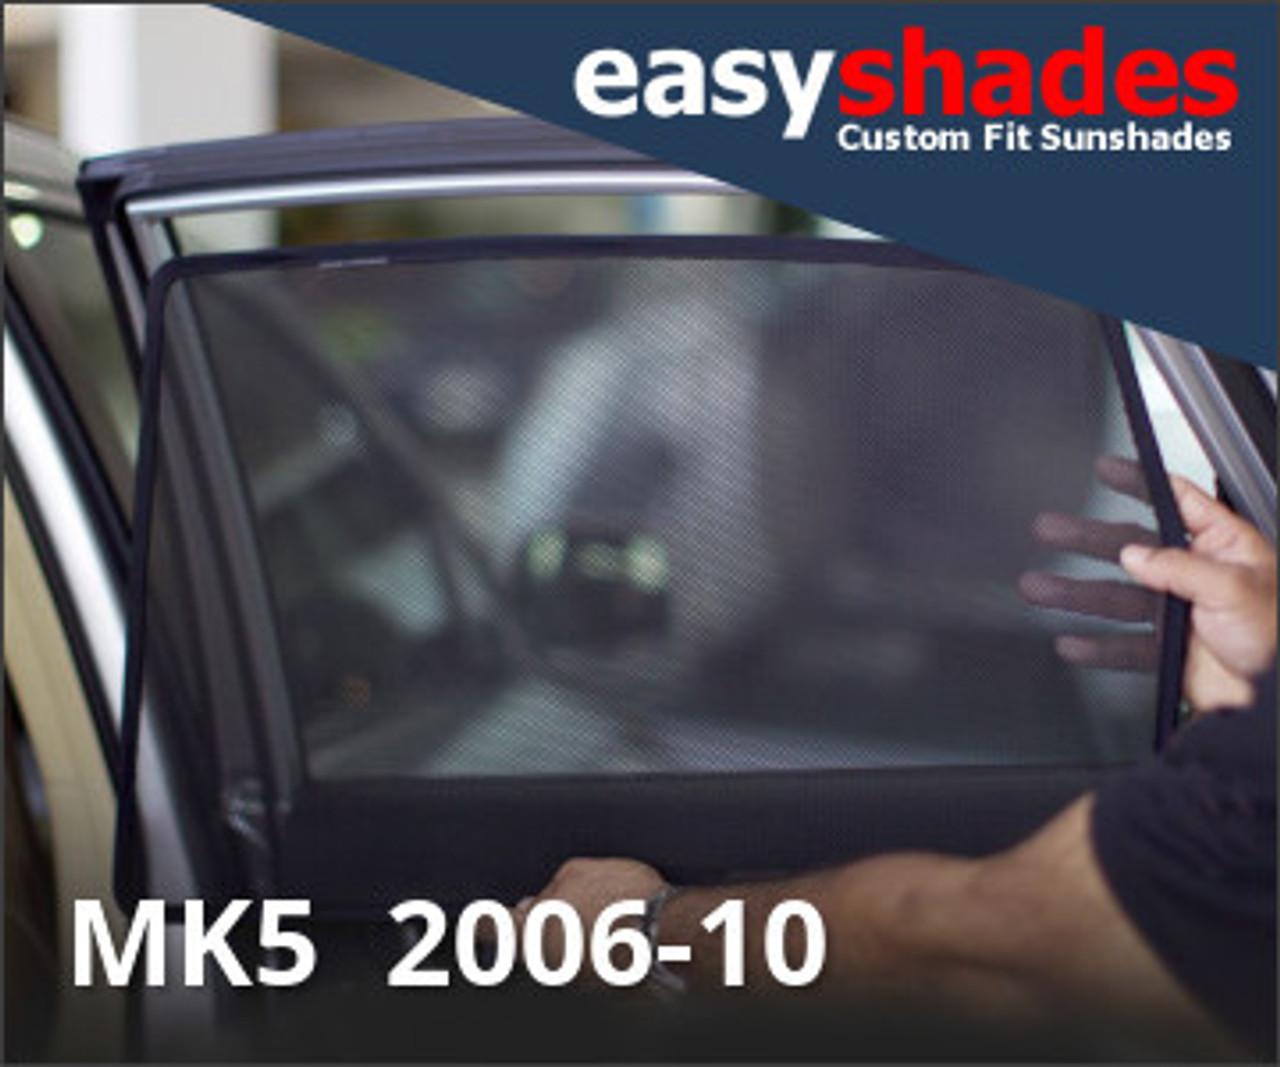 MK5 2006-10